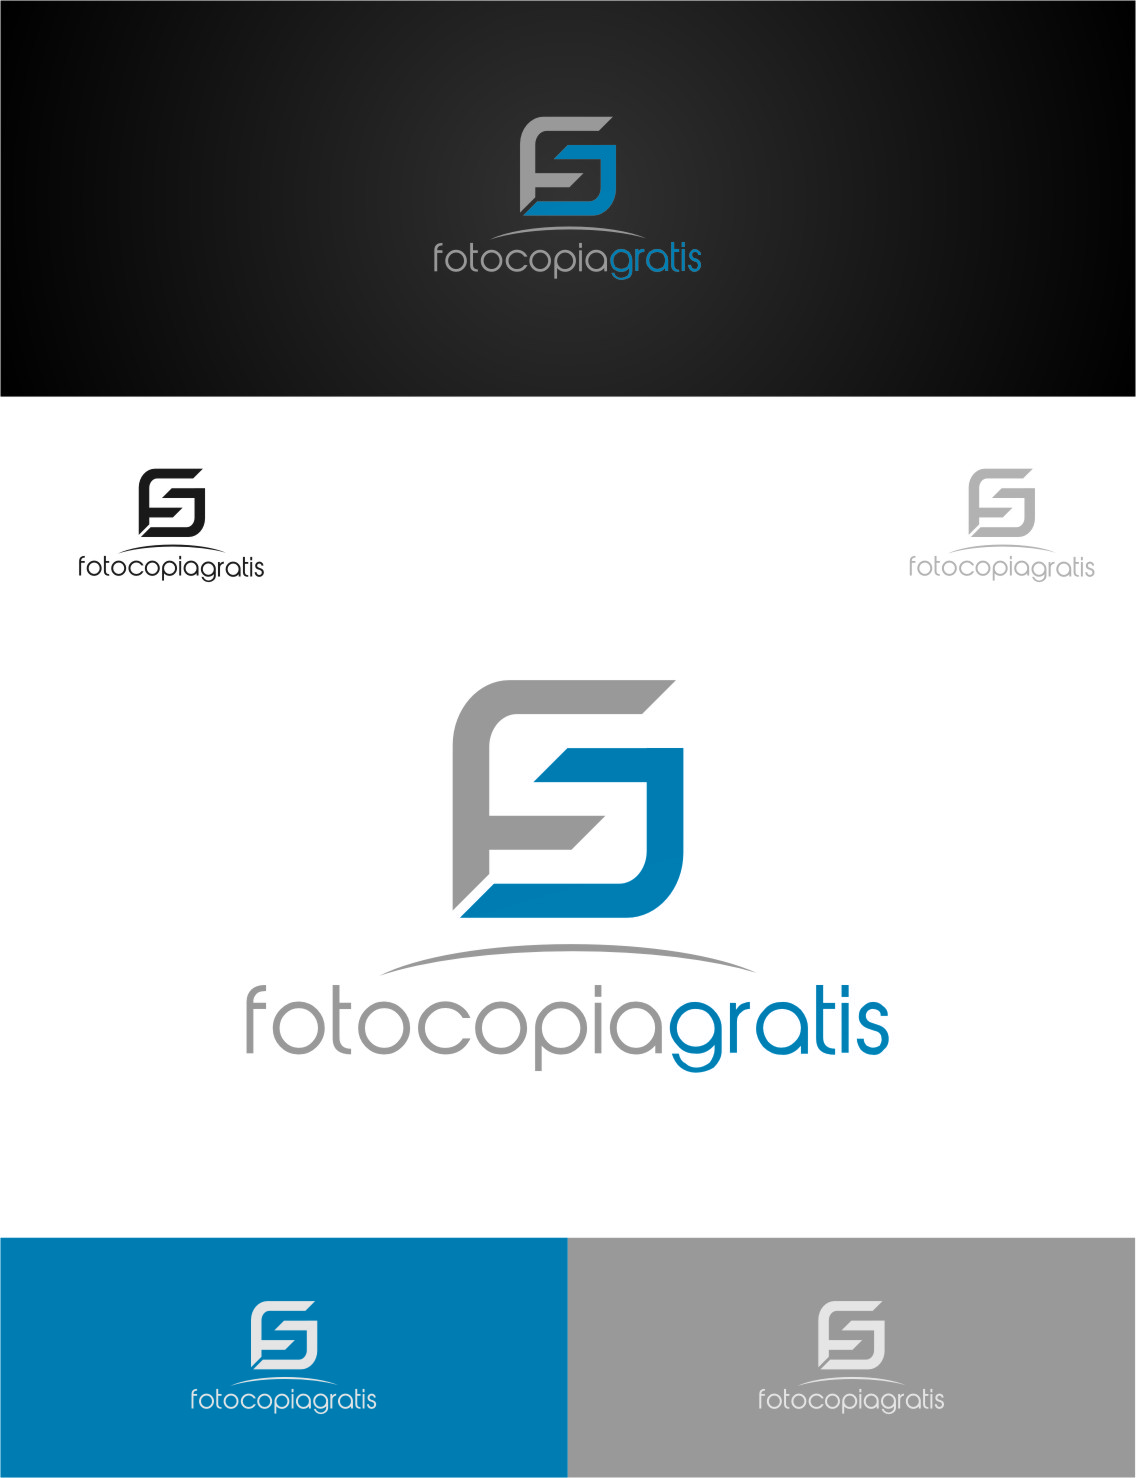 Logo Design by Ngepet_art - Entry No. 262 in the Logo Design Contest Inspiring Logo Design for Fotocopiagratis.